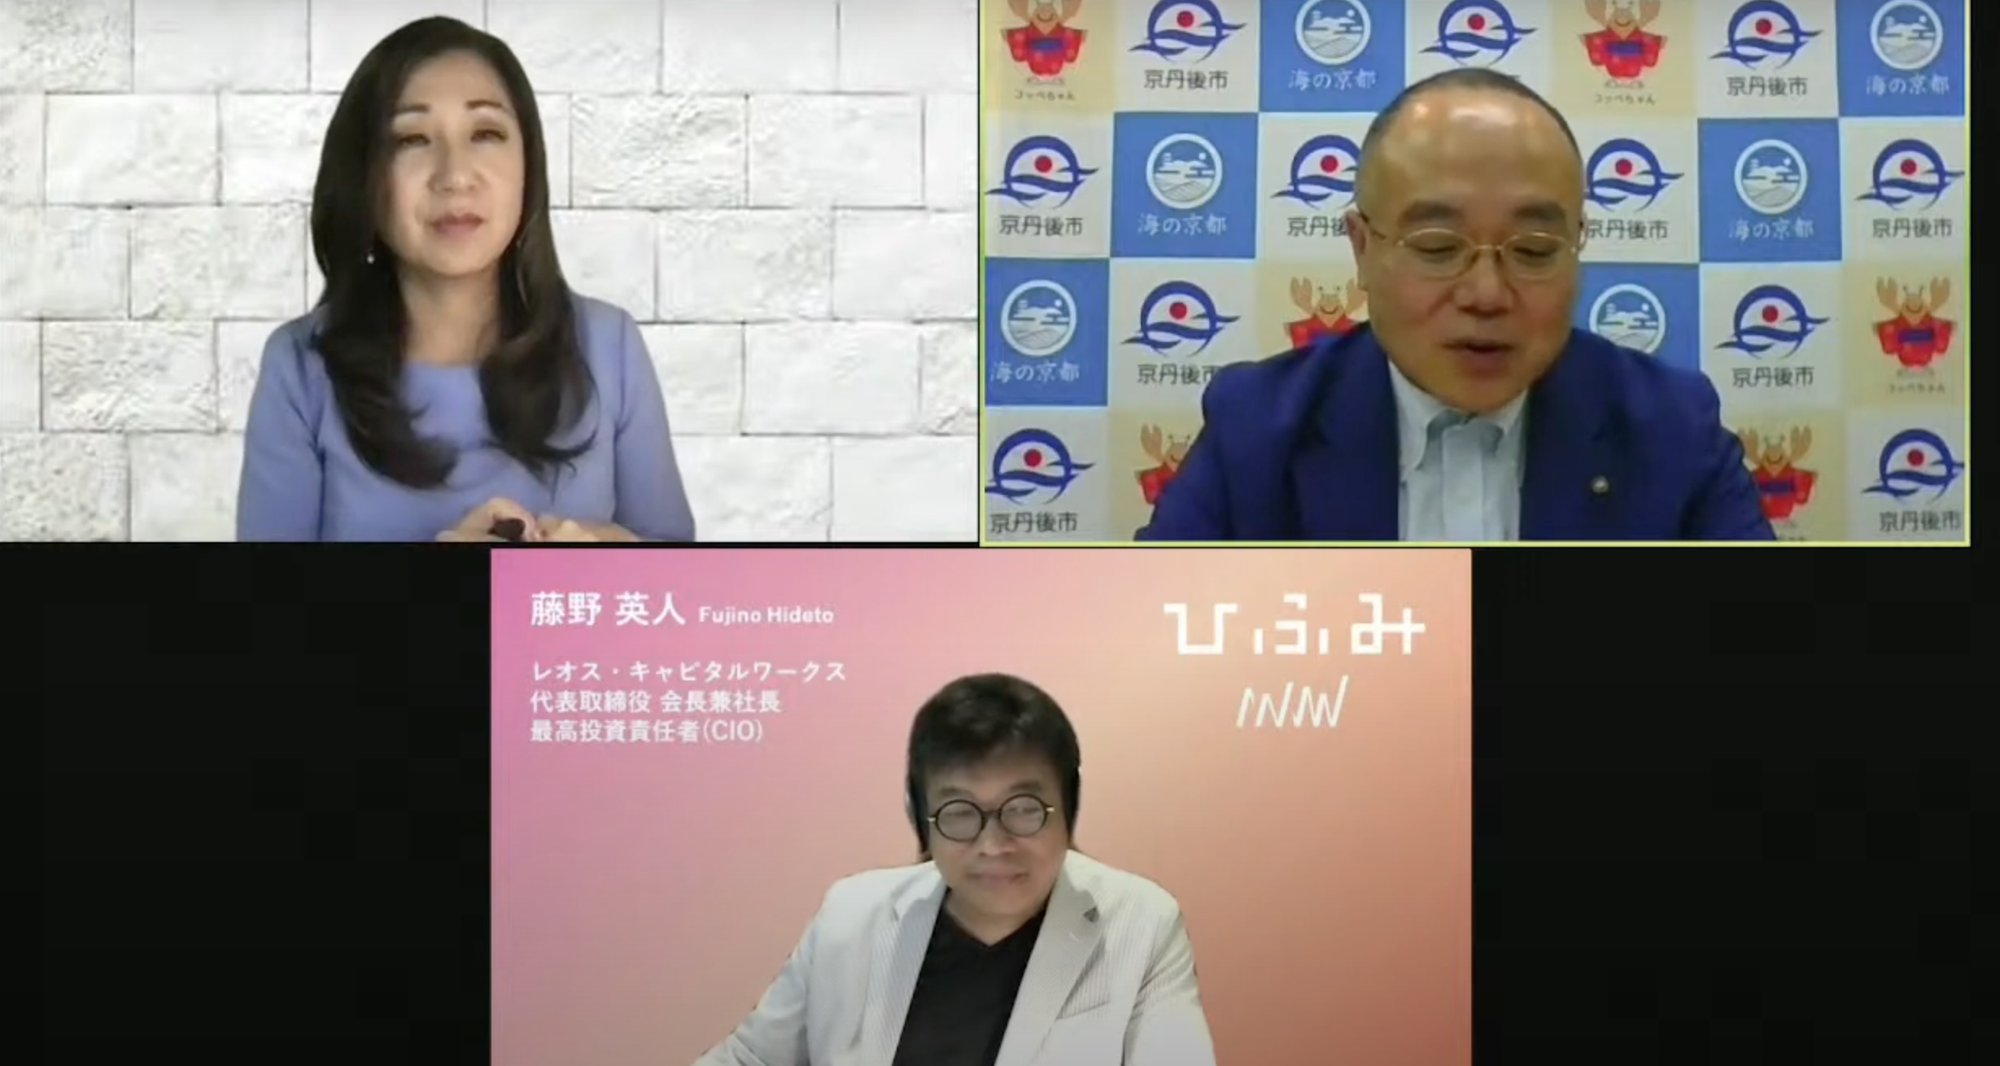 【開催報告】京丹後発!地方創生シンポジウム 藤野英人氏講演会